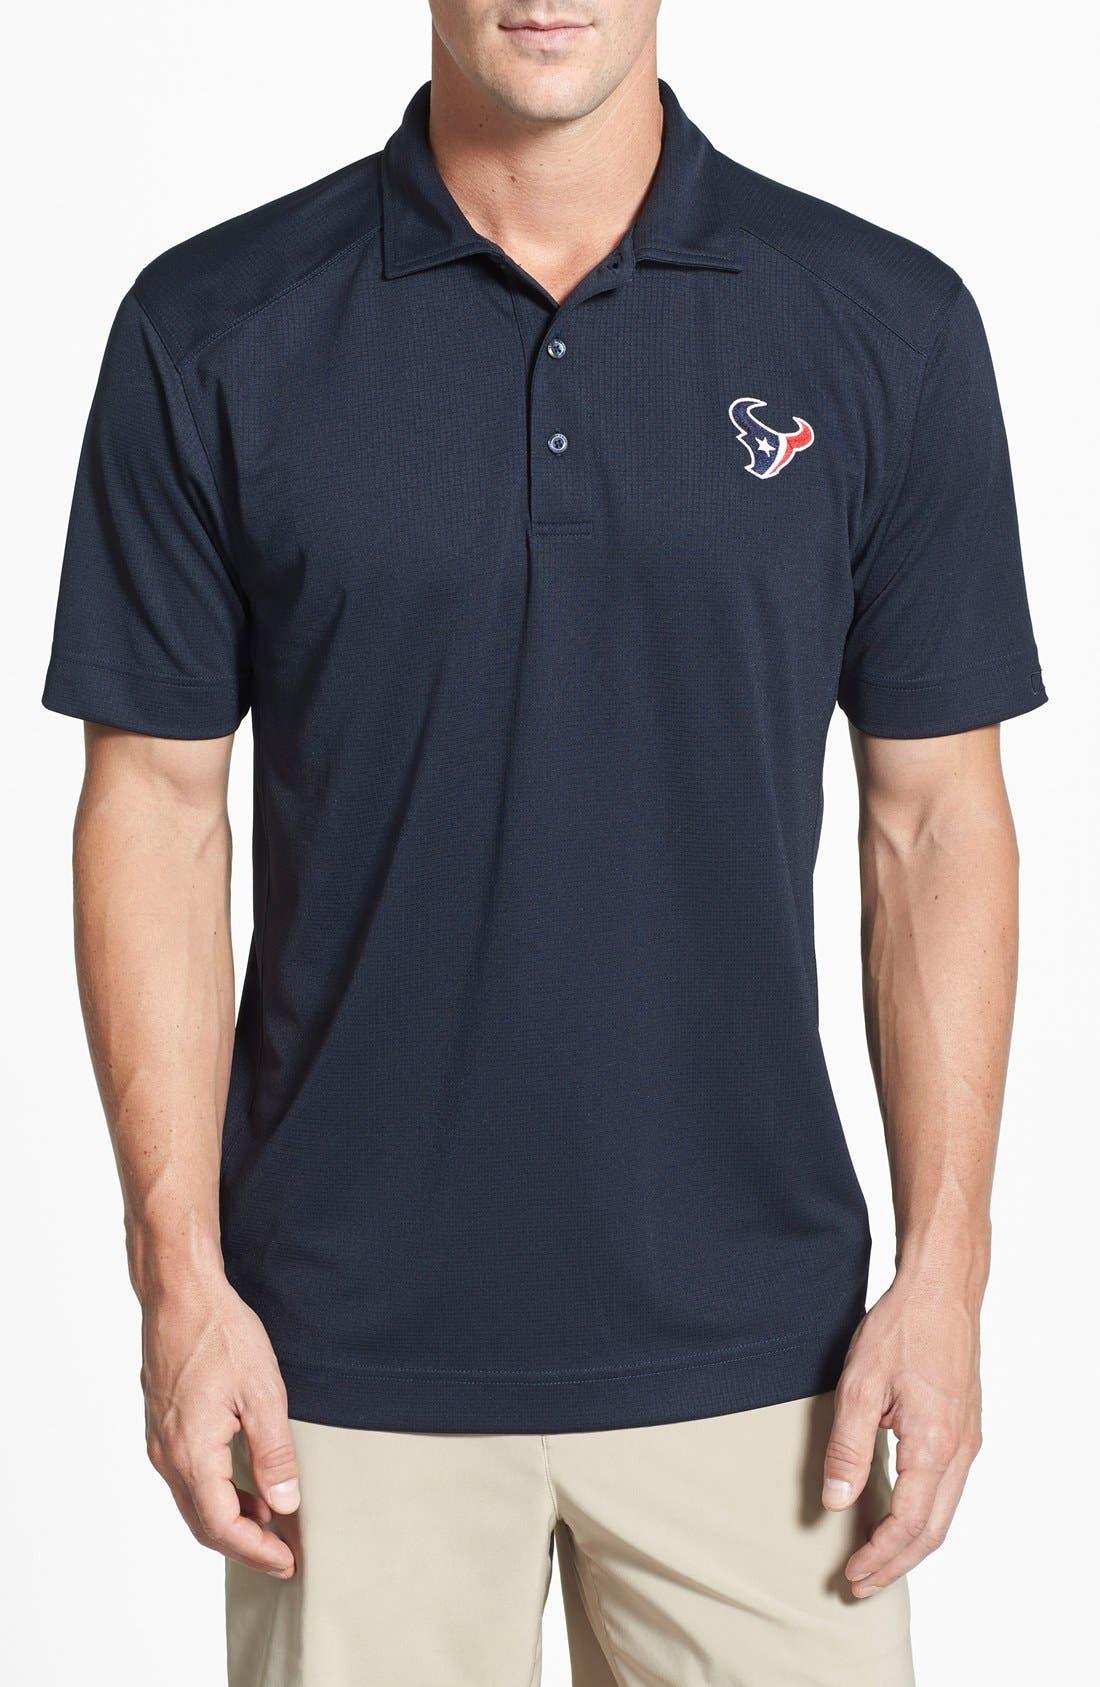 Houston Texans - Genre DryTec Moisture Wicking Polo,                         Main,                         color, Navy Blue